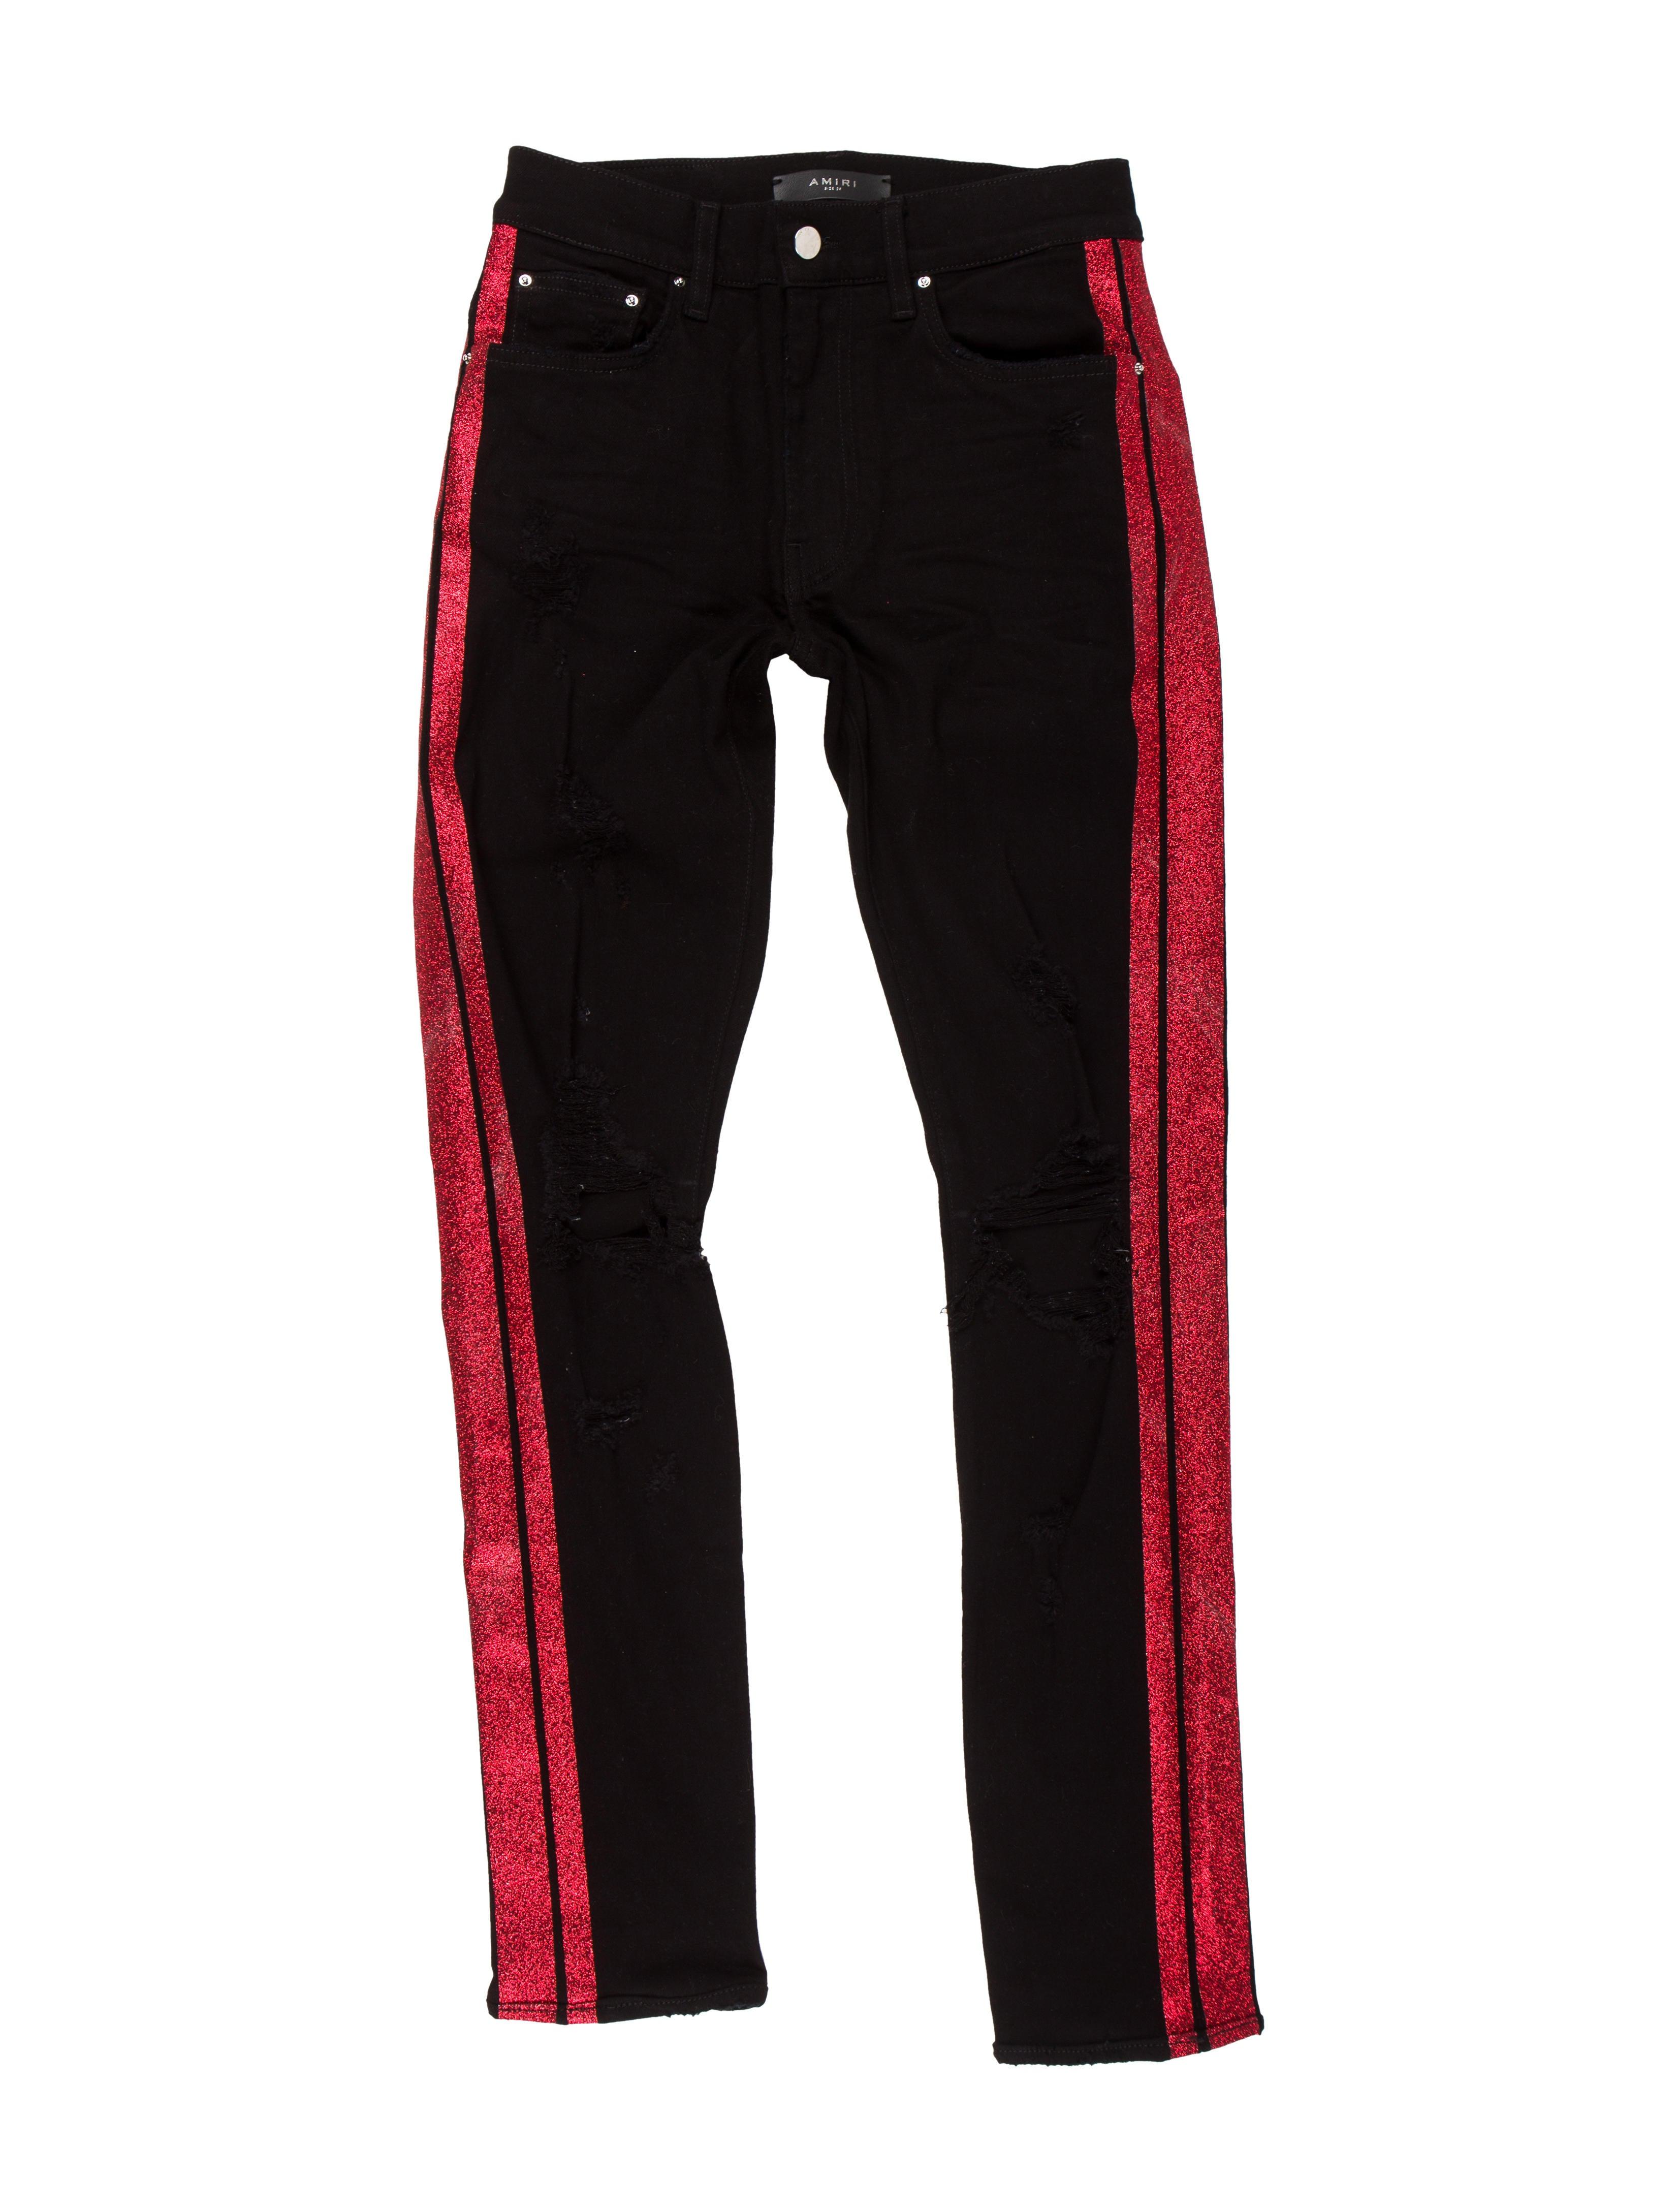 65f956ed650 Amiri Glitter Track Jeans - Clothing - AMIRI21212   The RealReal